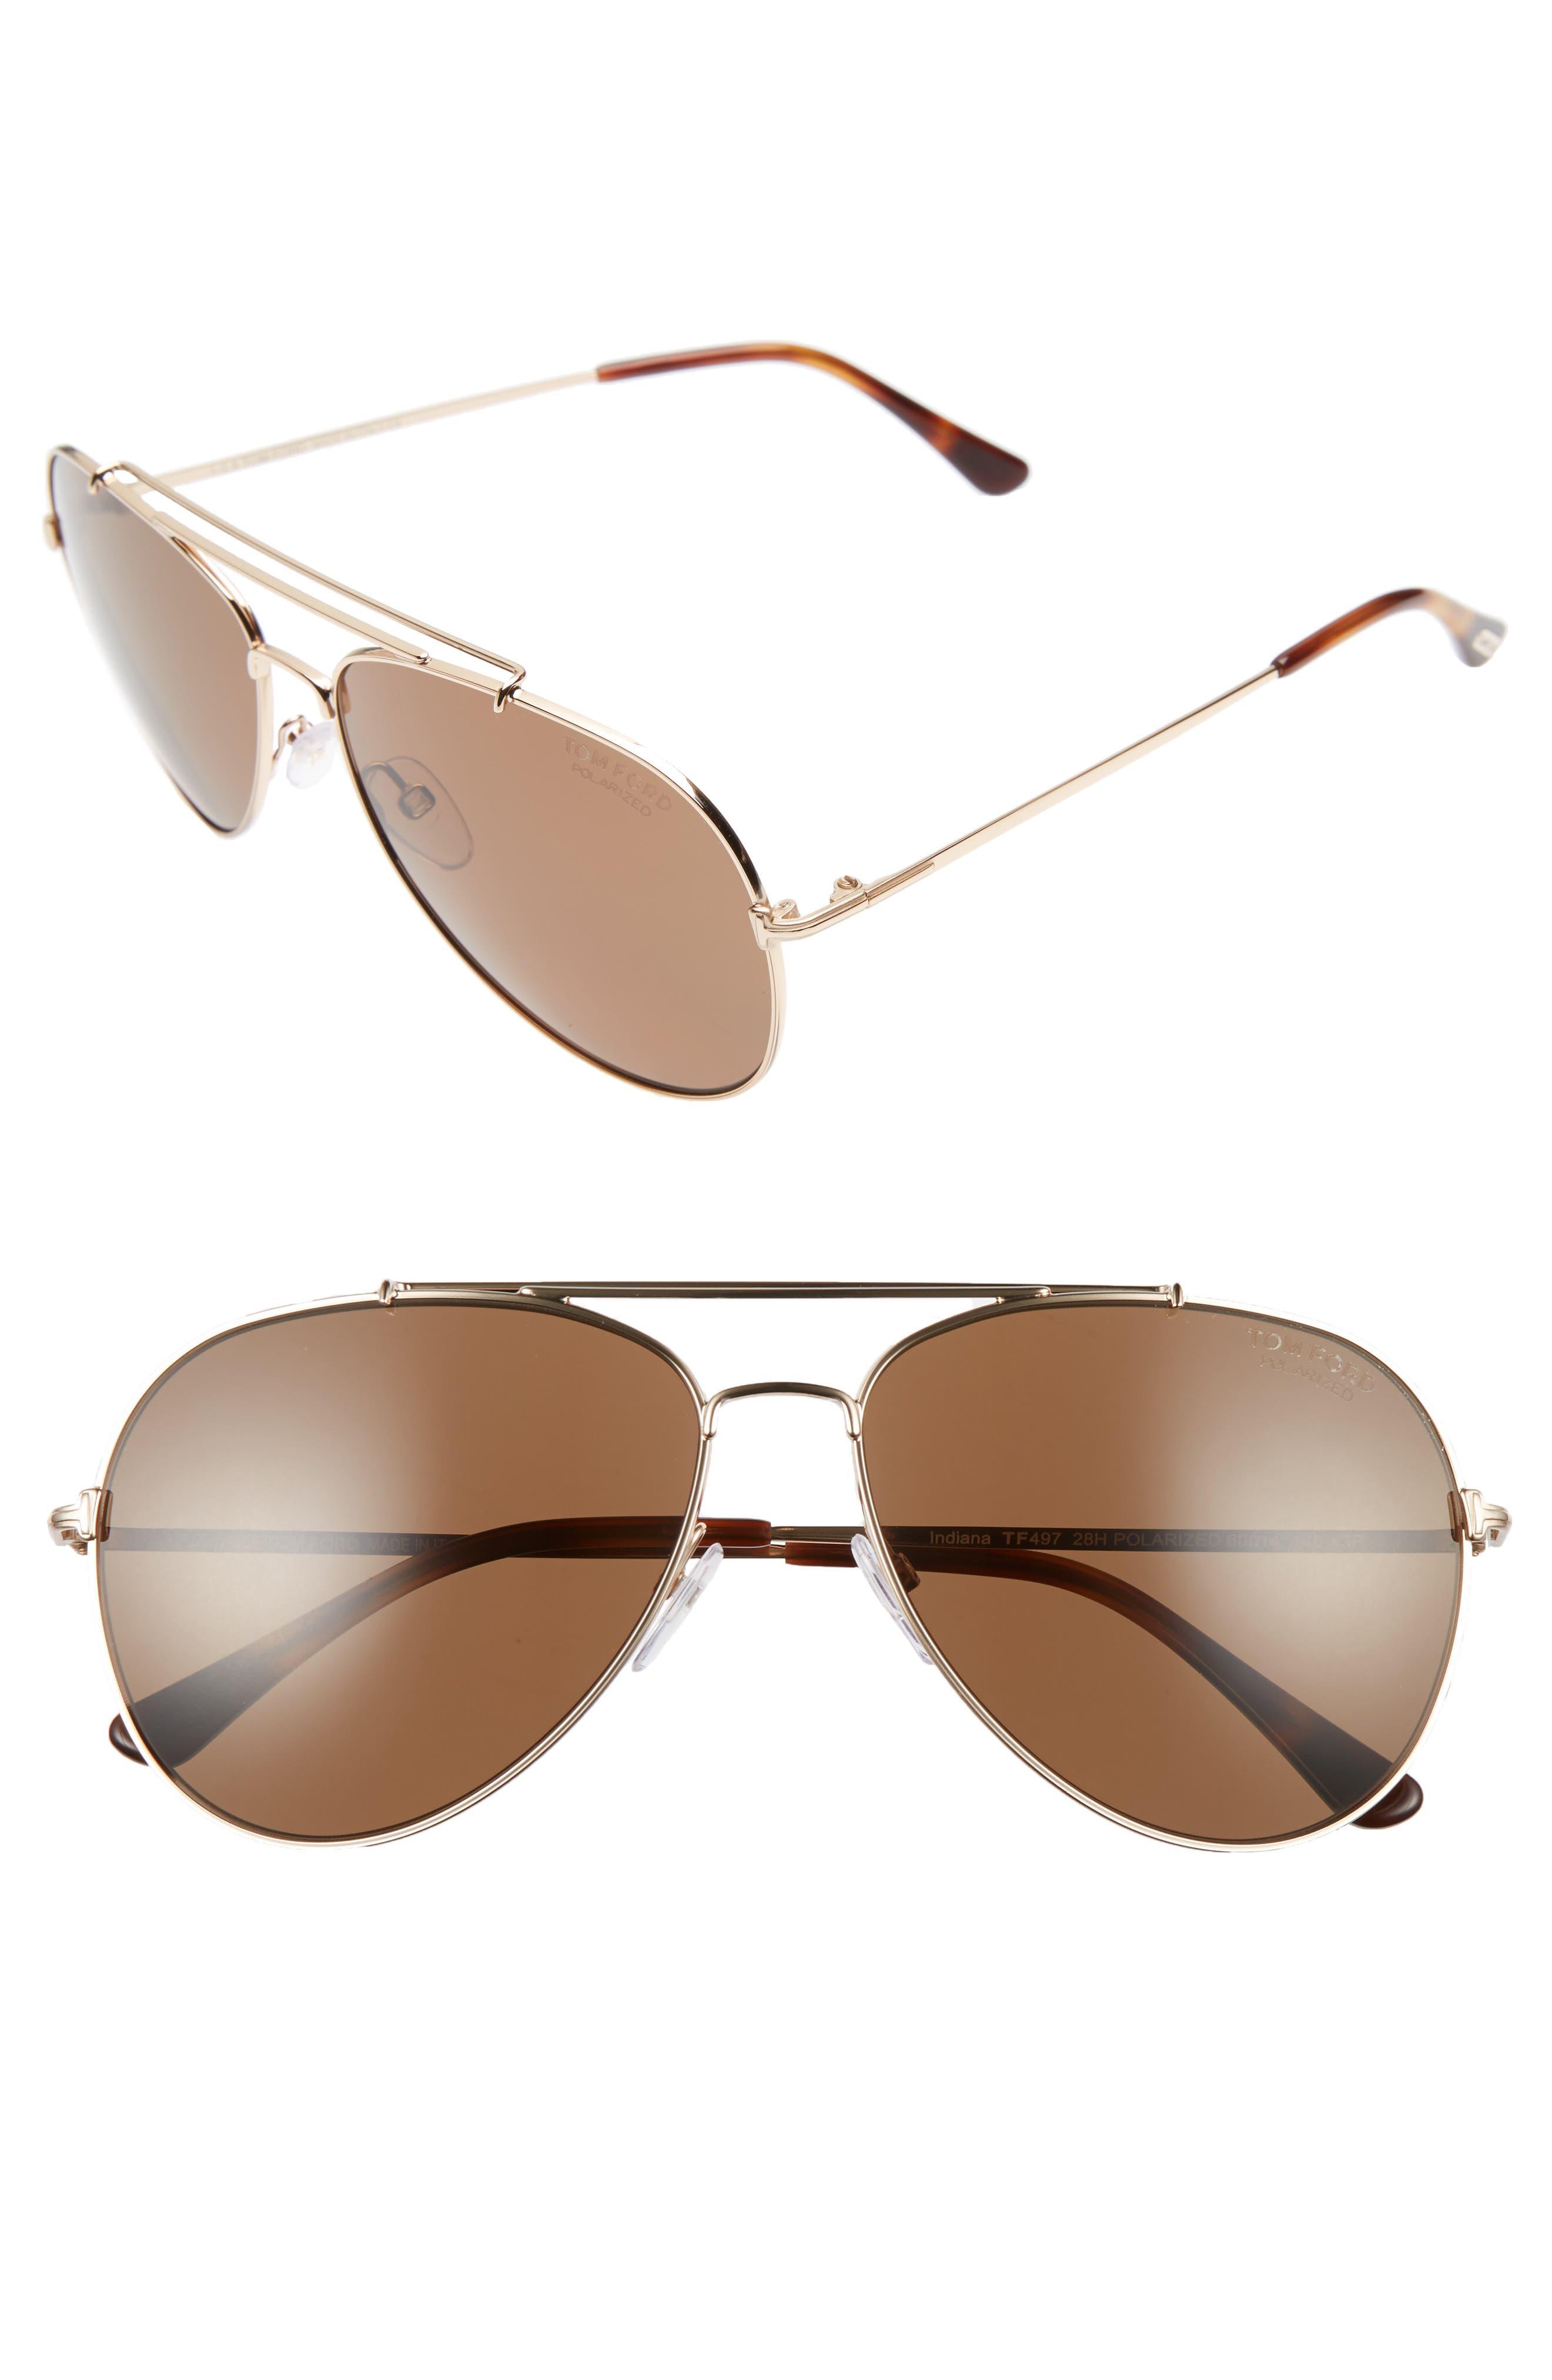 Indiana 58mm Polarized Aviator Sunglasses,                             Main thumbnail 1, color,                             Rose Gold/ Blonde/ Brown Polar